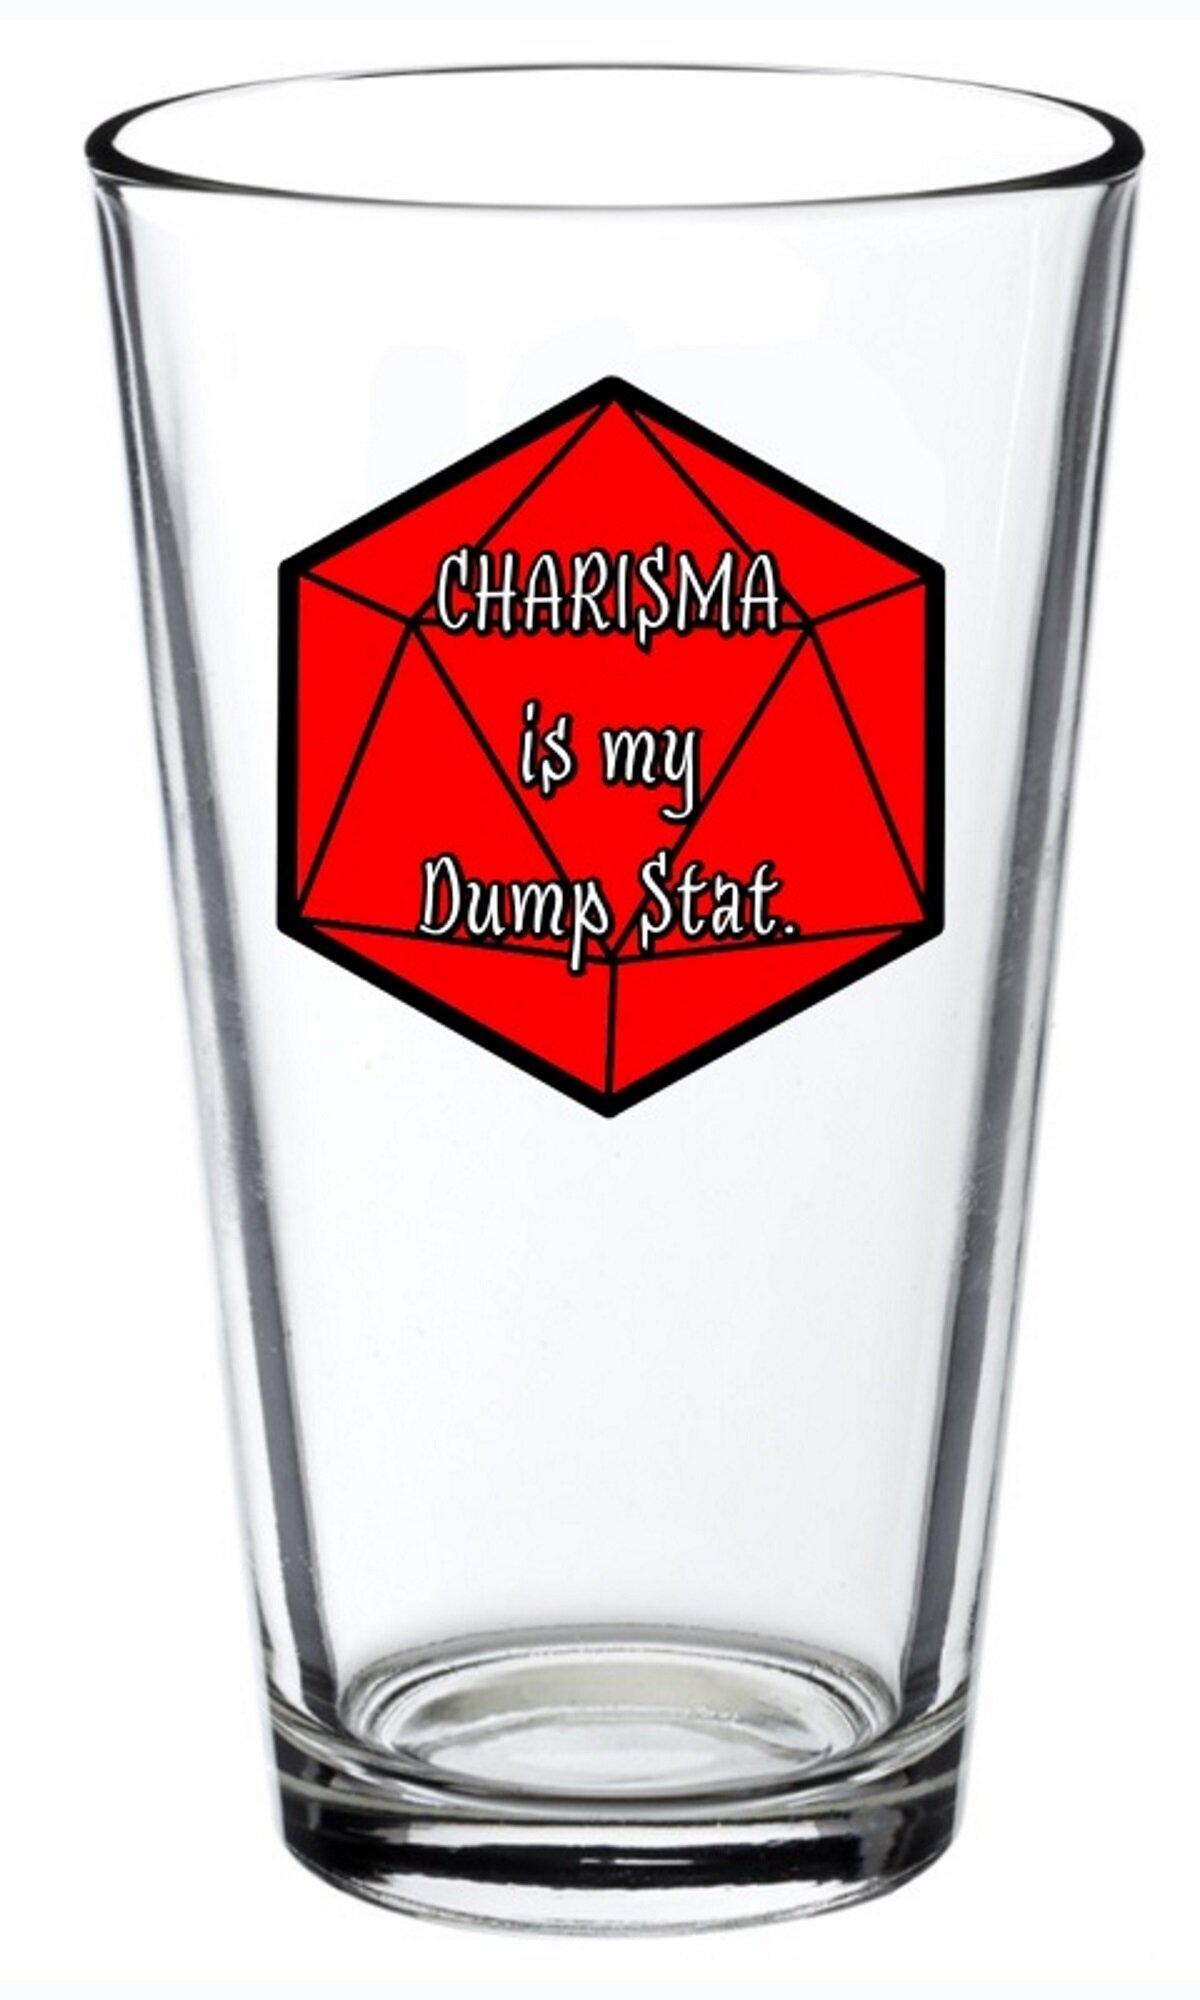 Charisma is my Dump Stat.